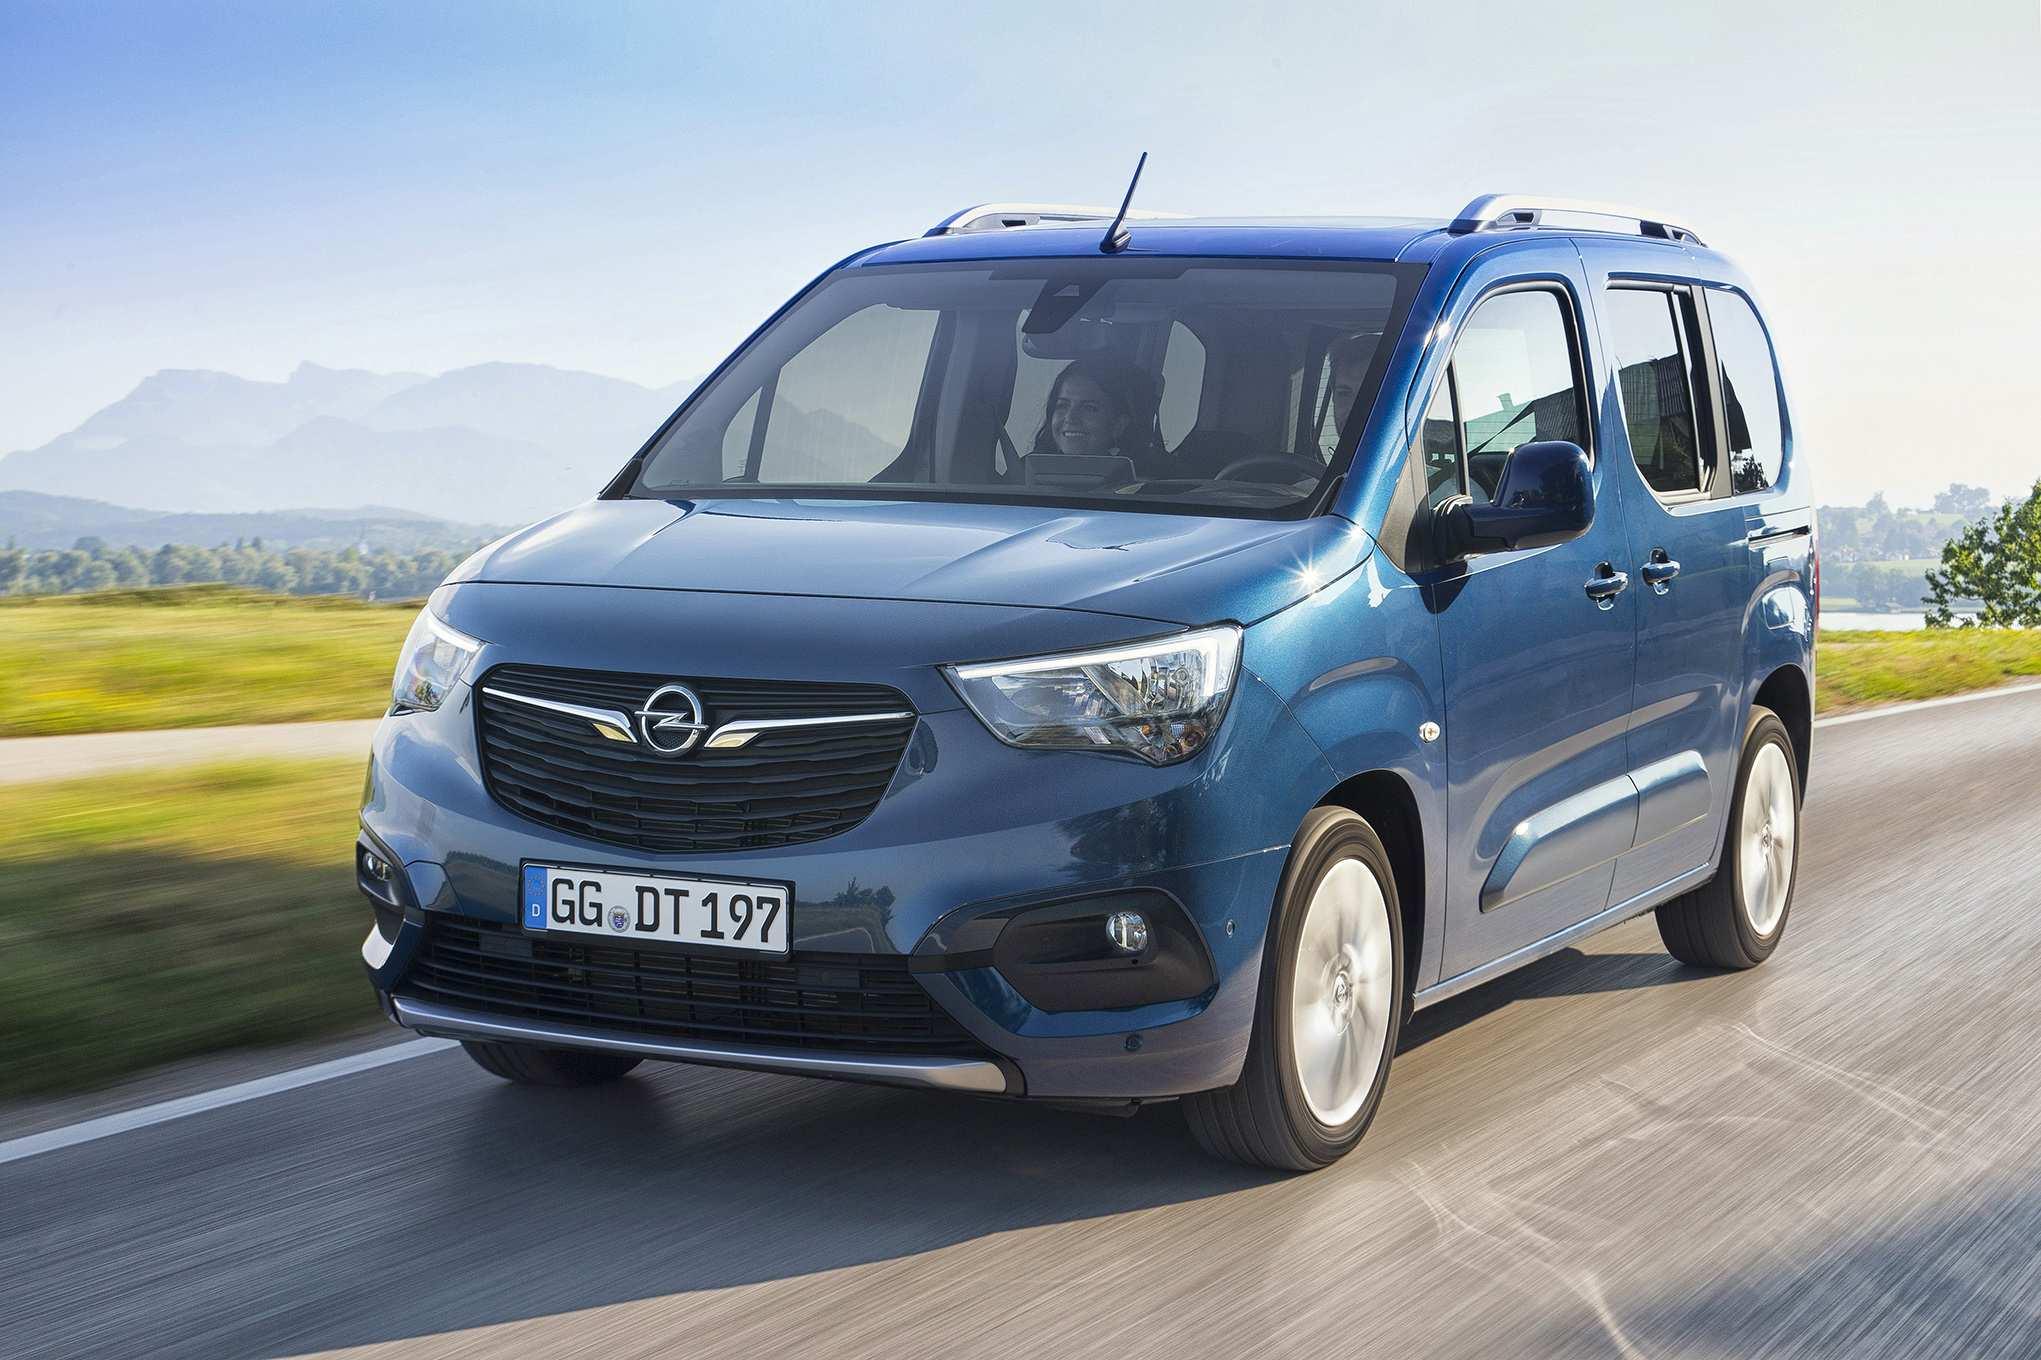 25 New Neuer Opel Vivaro 2020 Picture for Neuer Opel Vivaro 2020